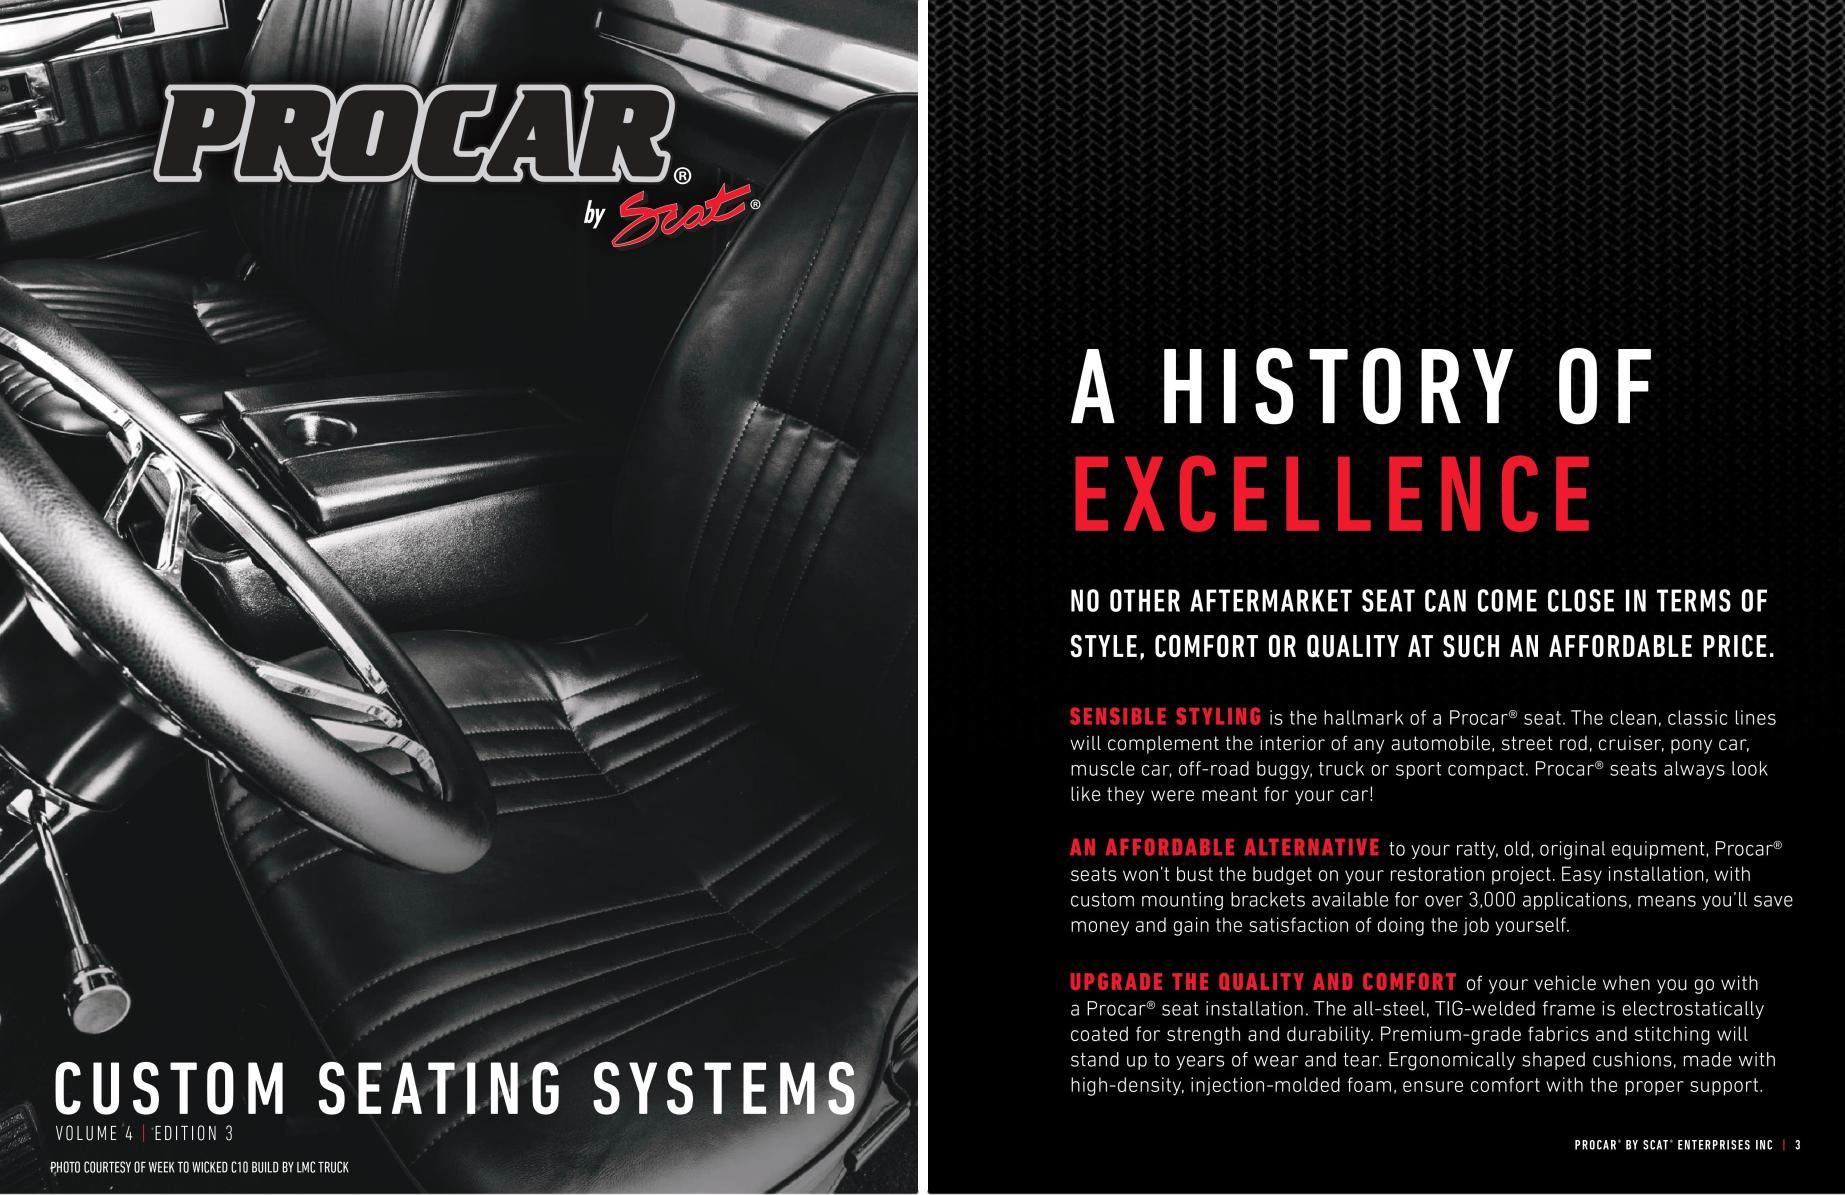 Procar by SCAT Catalog 2019